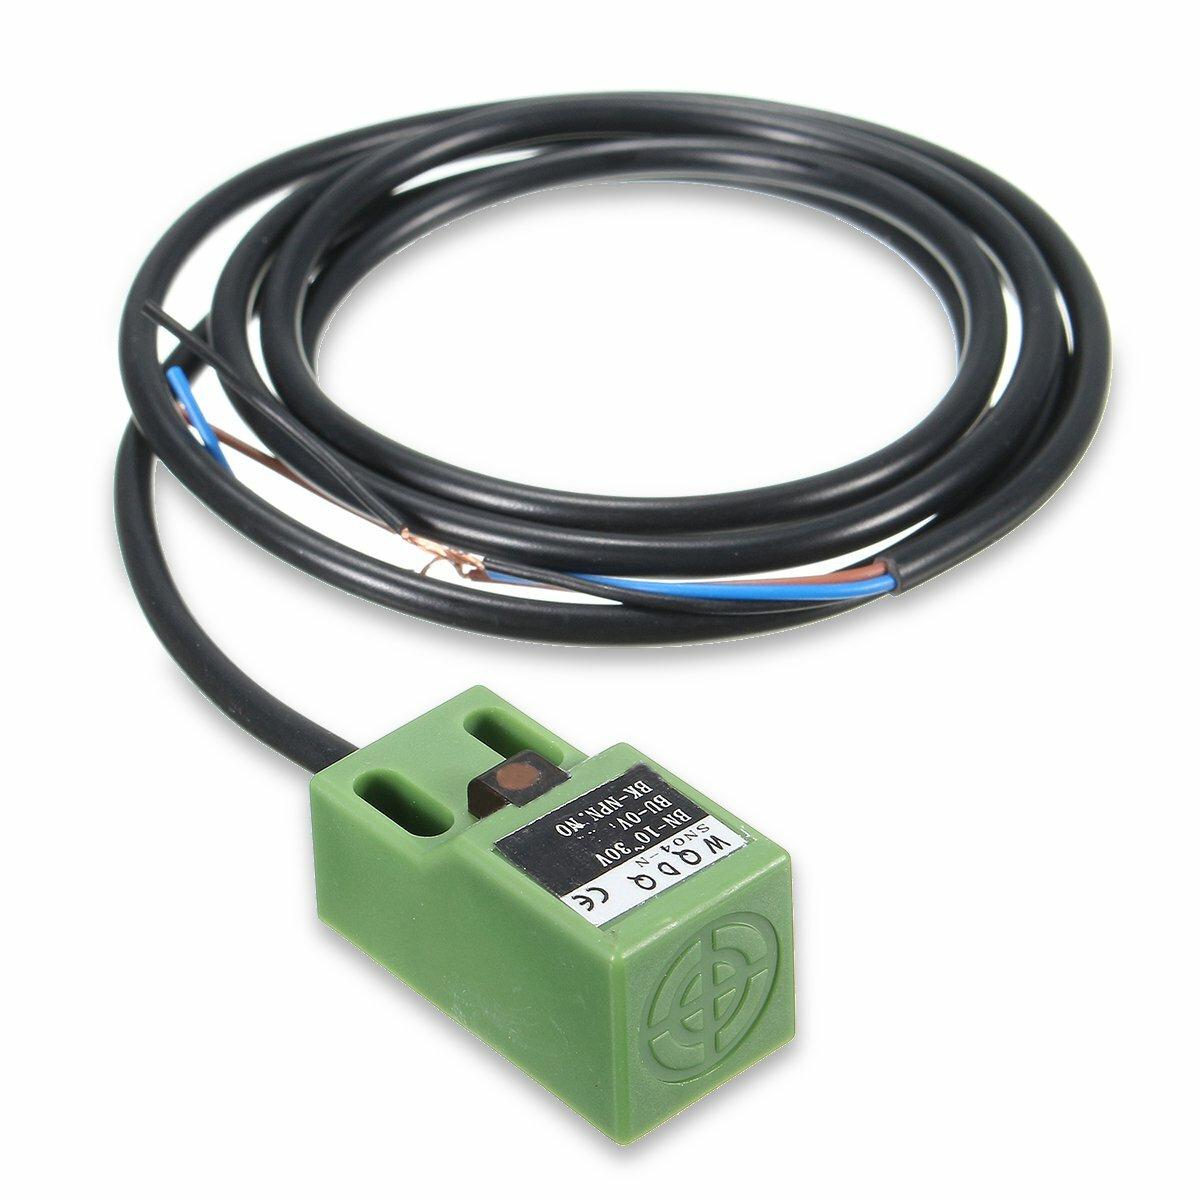 hight resolution of sn04 n proximity sensor wiring diagram wiring library ac proximity sensor wiring diagram sn04 n 5mm